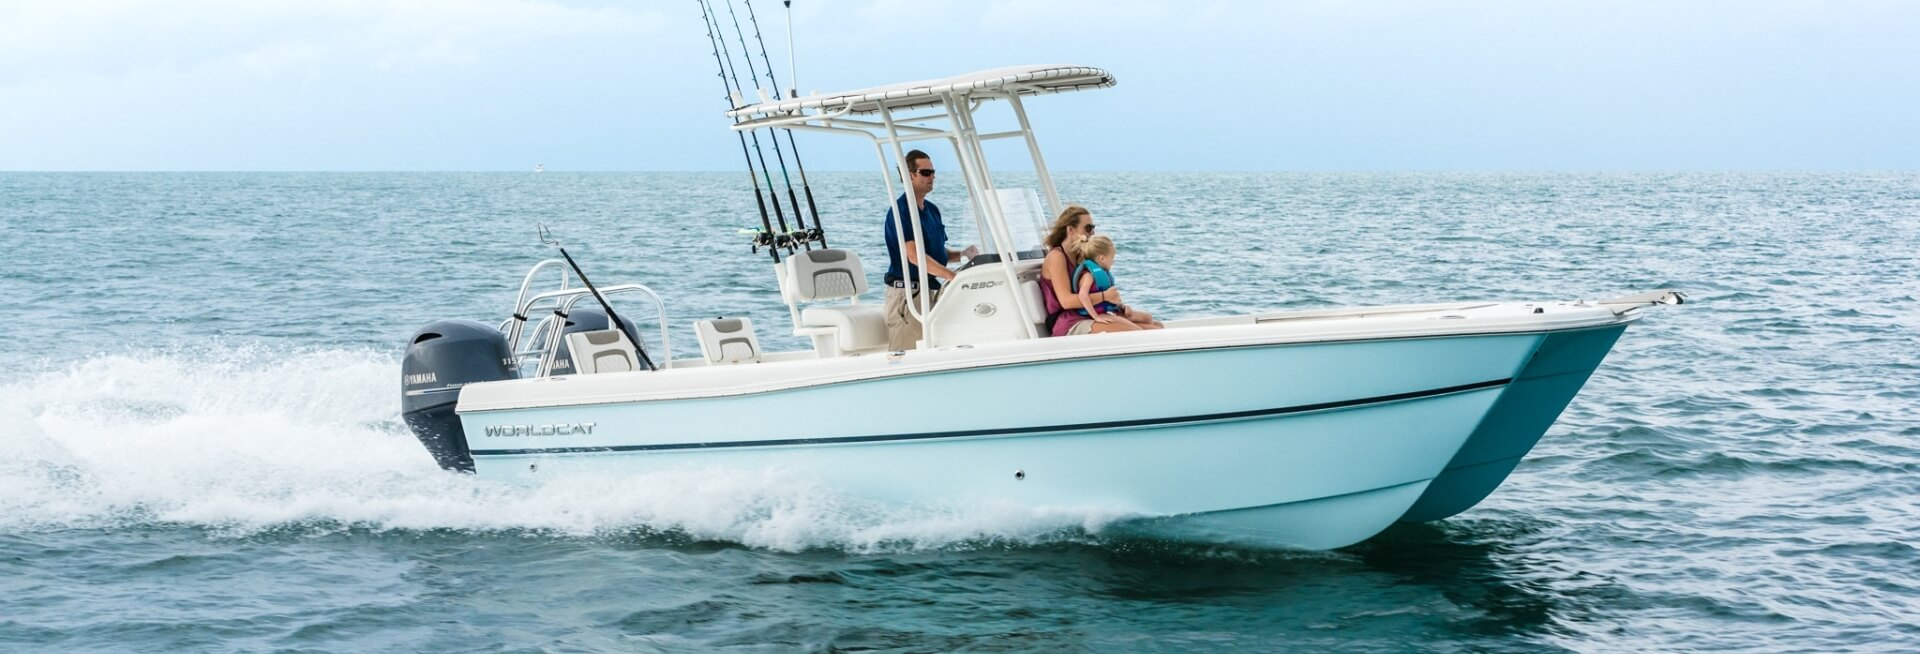 Butler Marine   Boat Dealership   Charleston & Beaufort